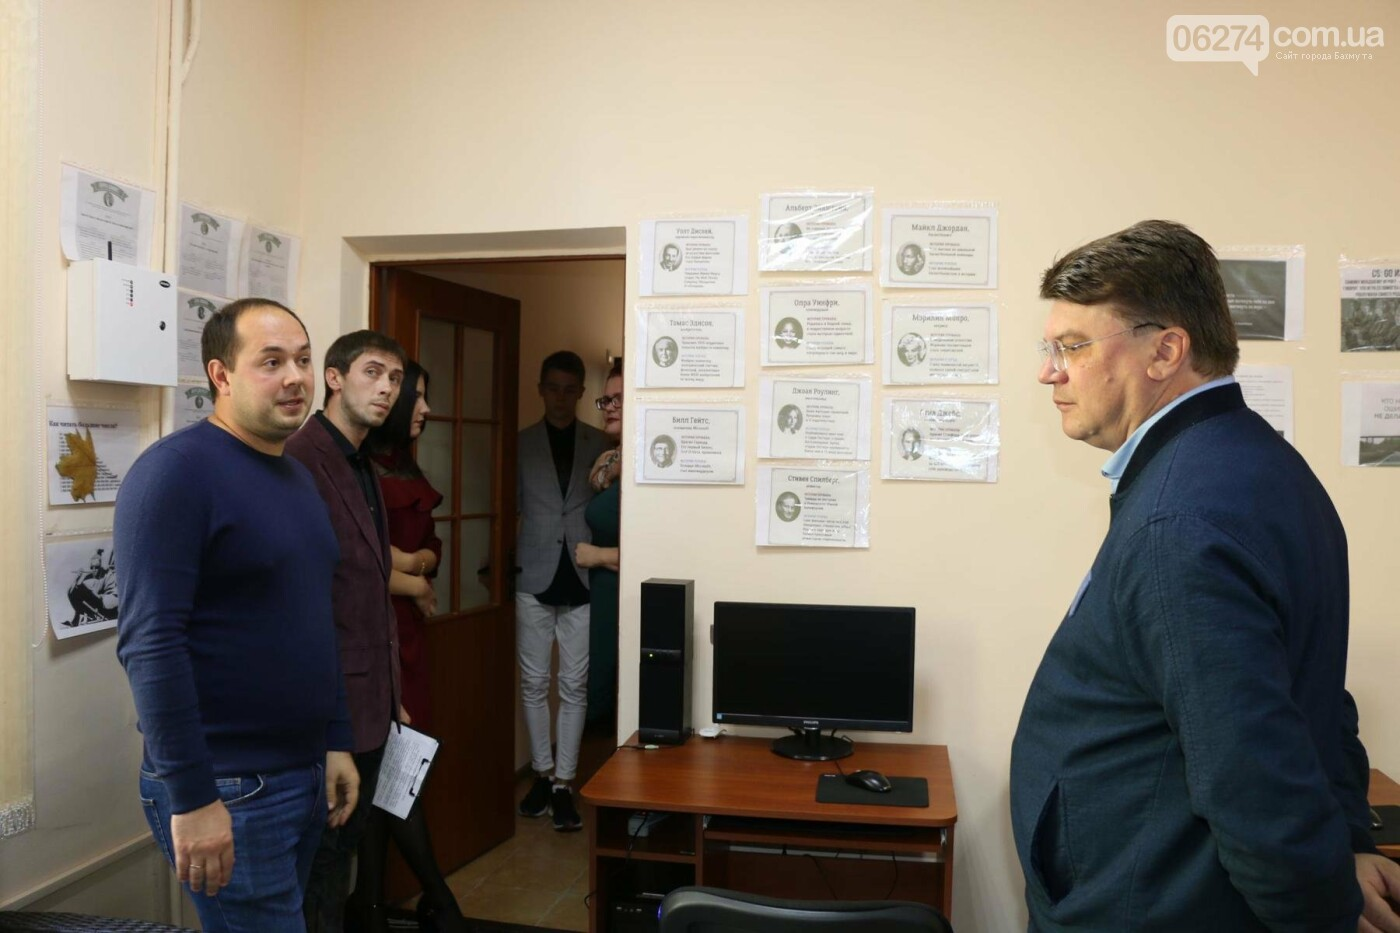 Бахмут посетил министр молодежи и спорта Украины, фото-3